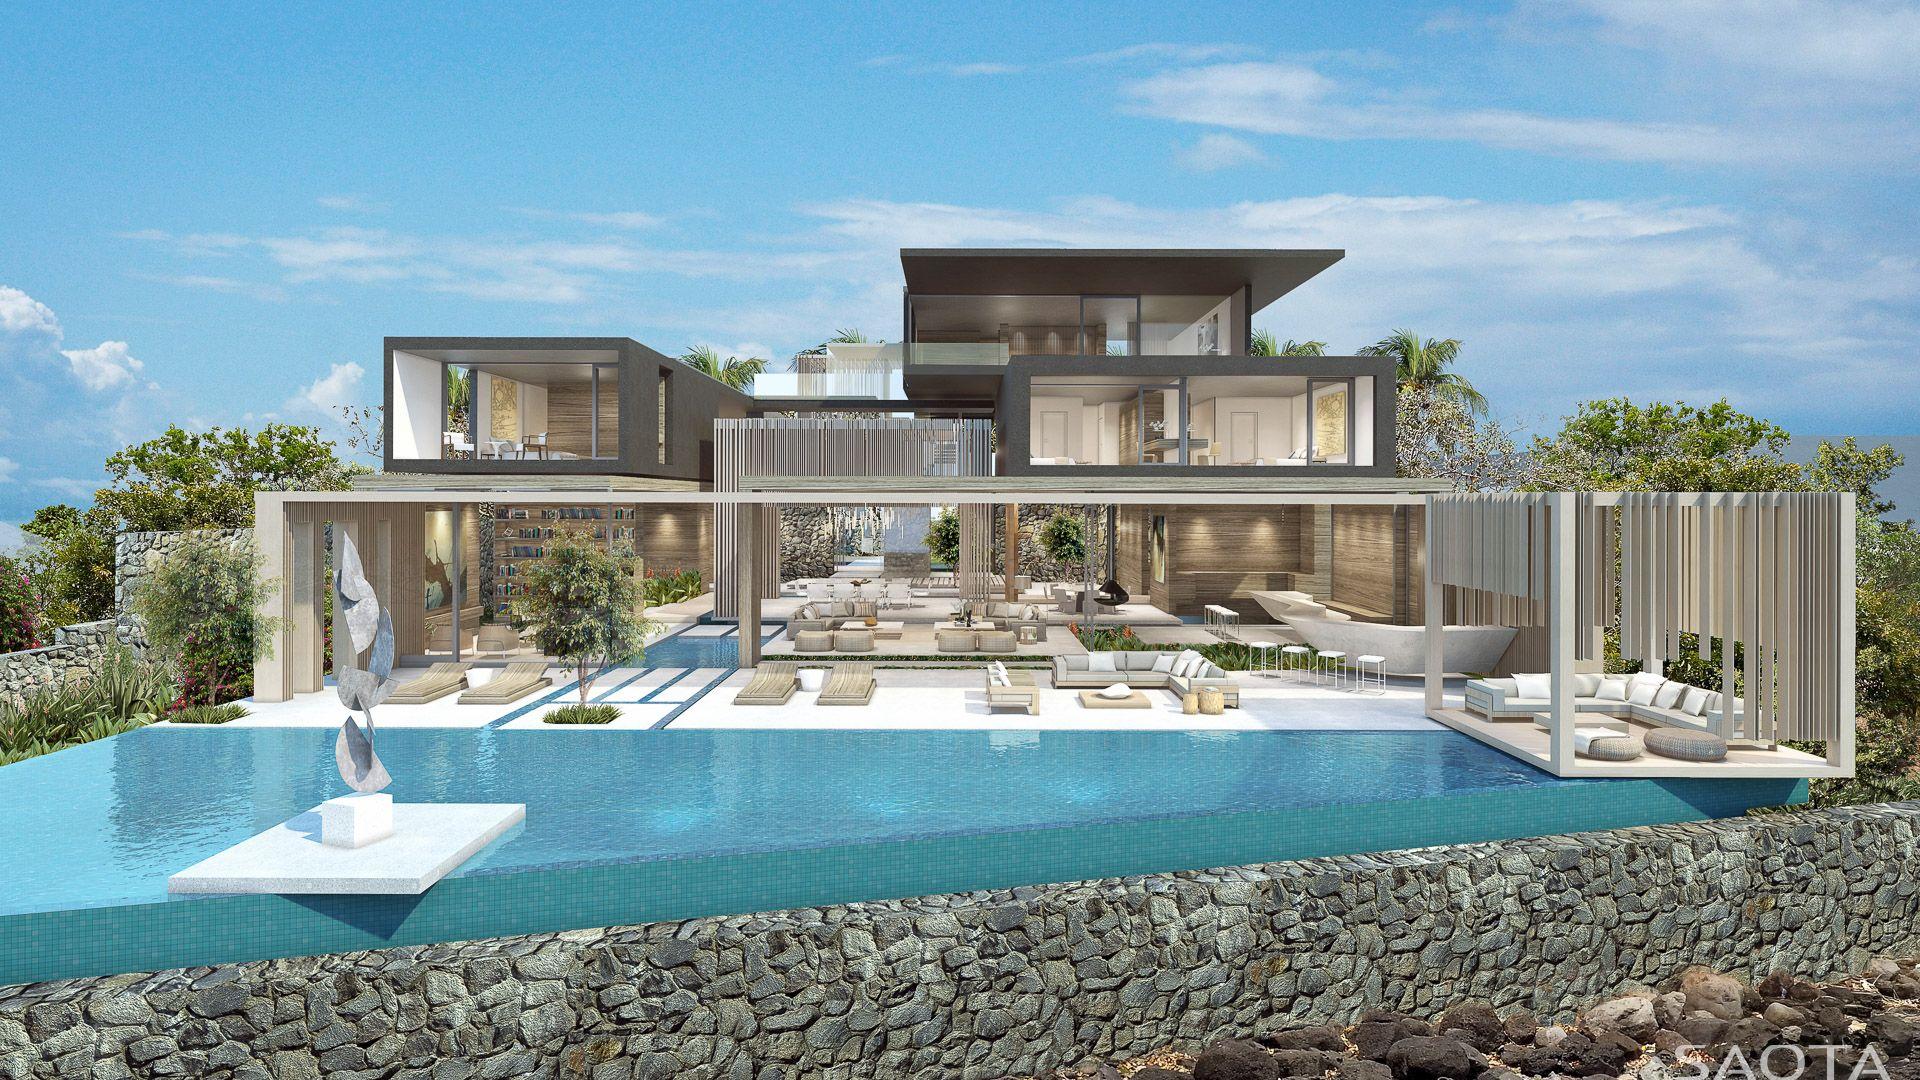 House design mauritius - Mauritius House By Saota Stefan Antoni Olmesdahl Truen Architects